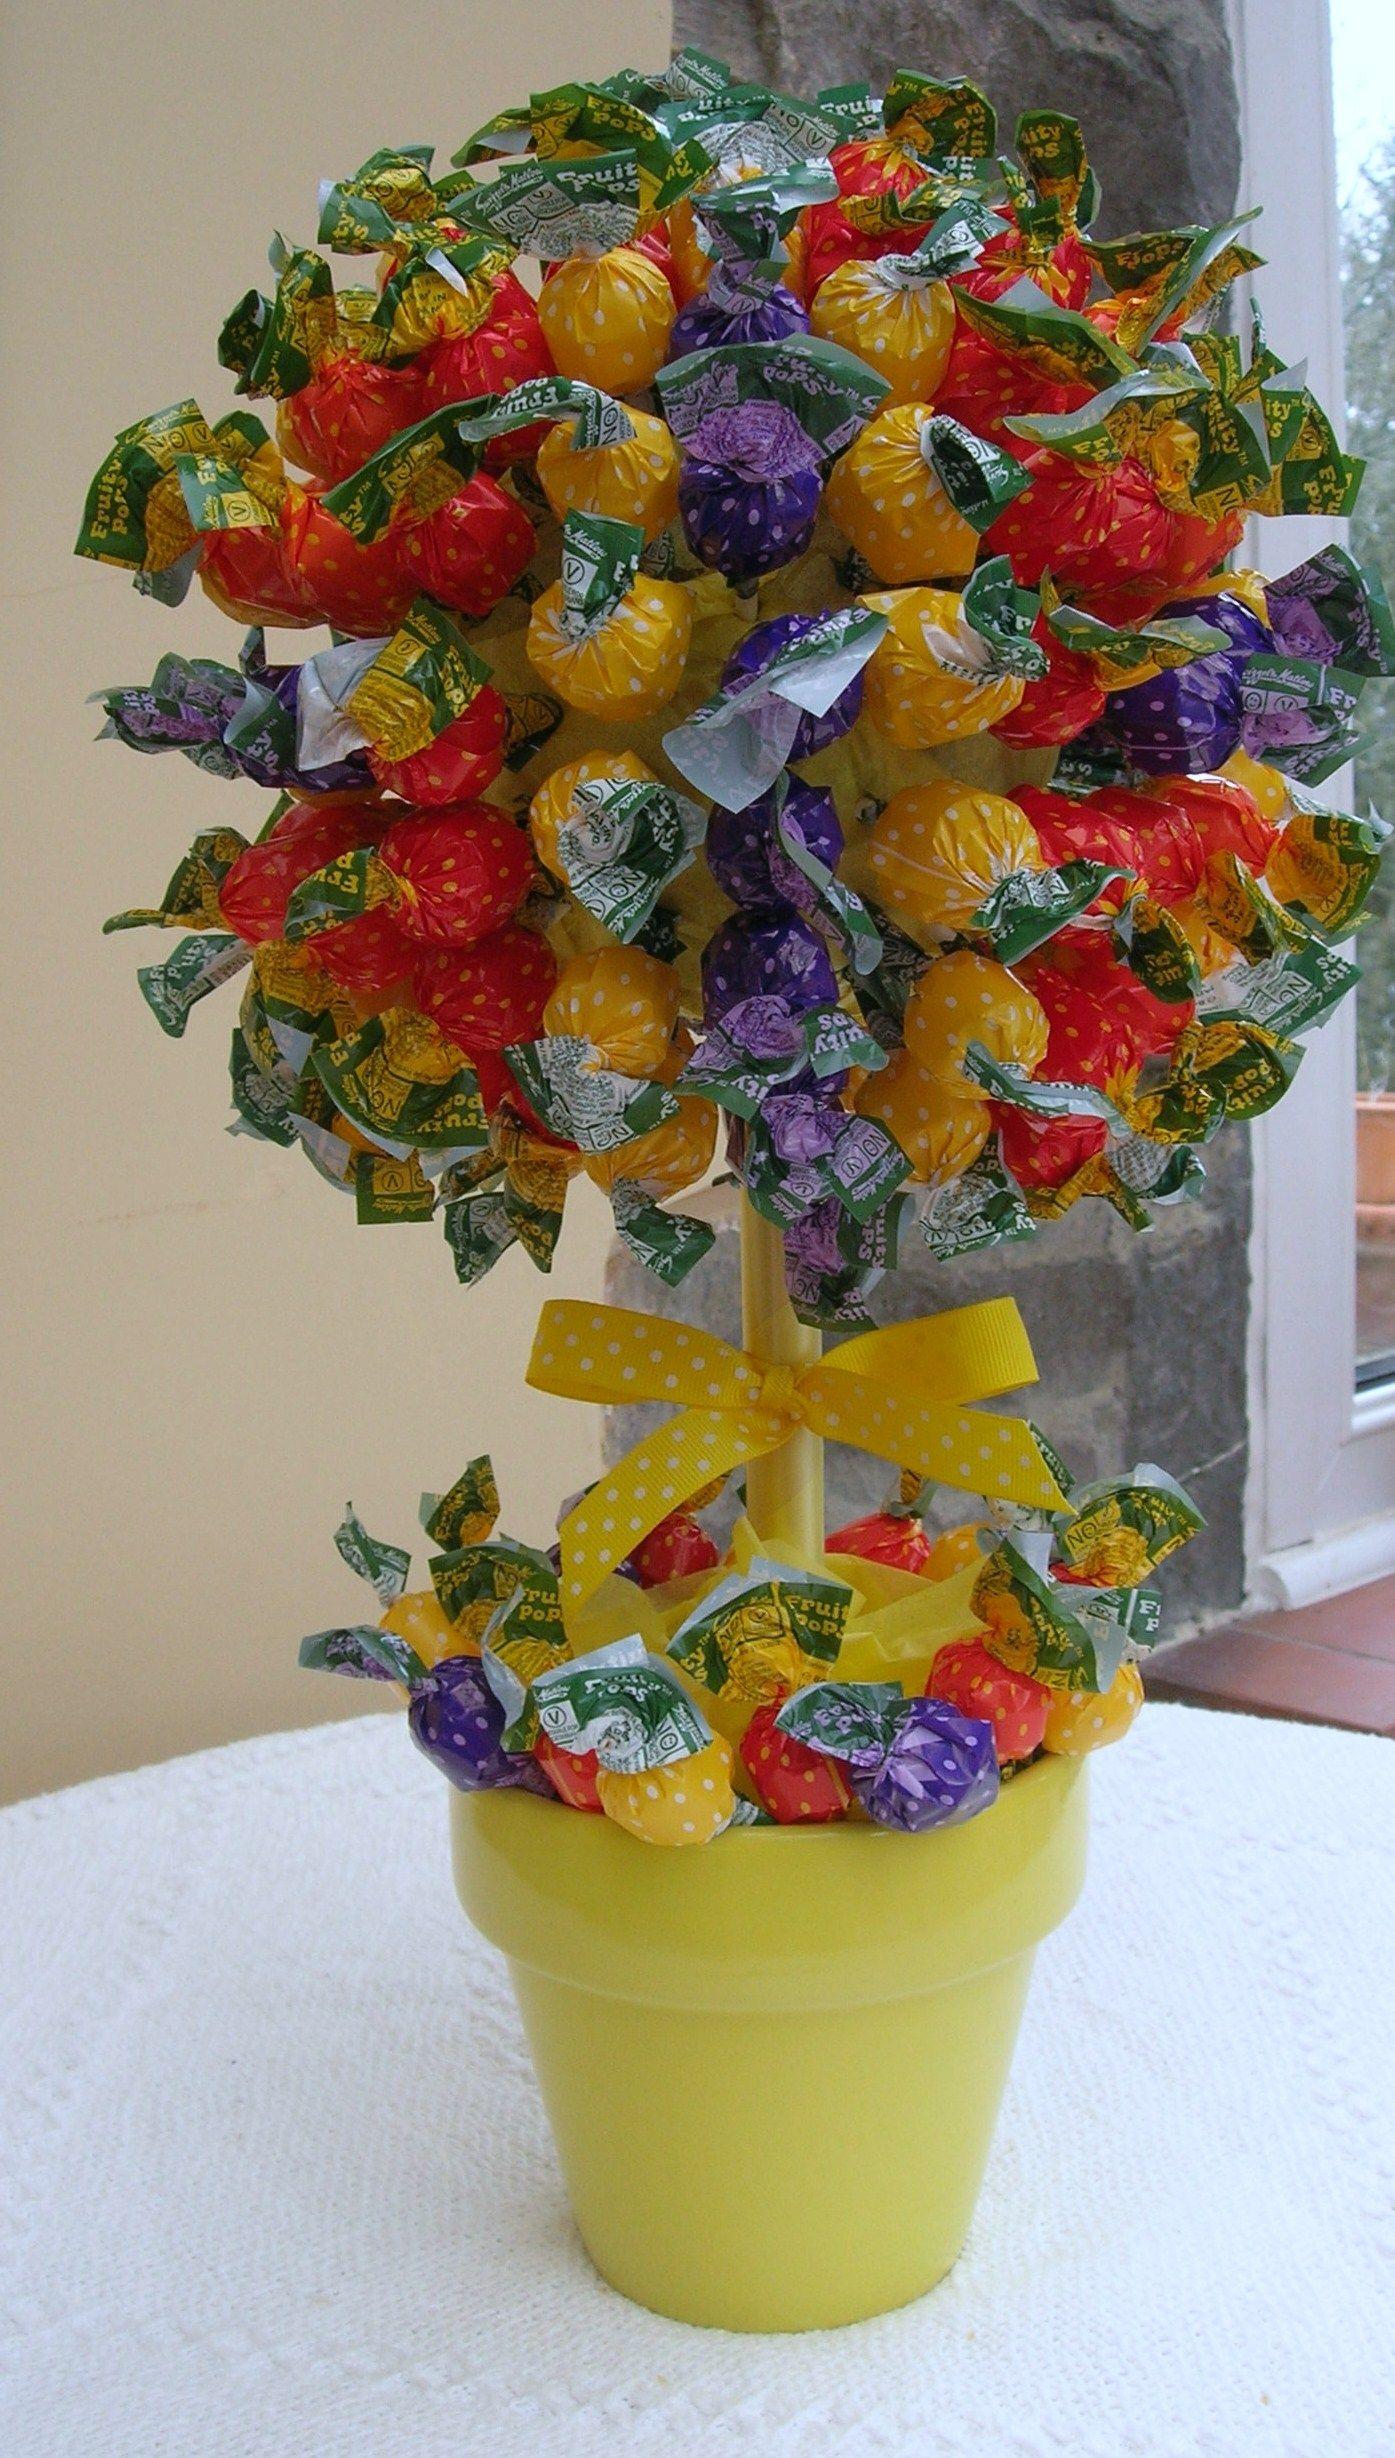 Lolly sweet tree | ideas | Pinterest | Sweet trees, Candy bouquet ...